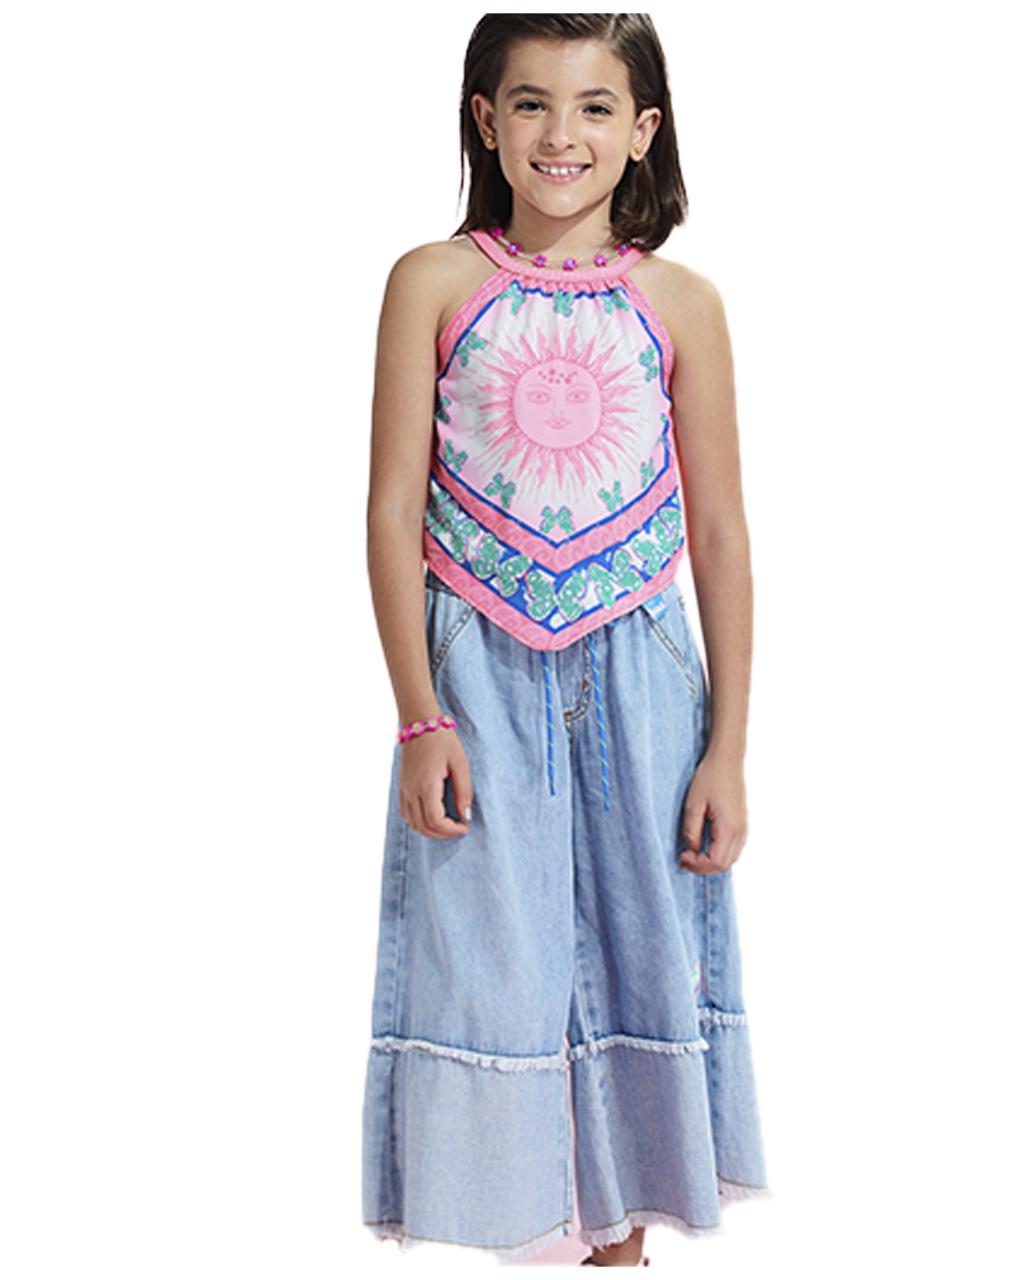 Blusa Infantil Bandana Rosa Animê